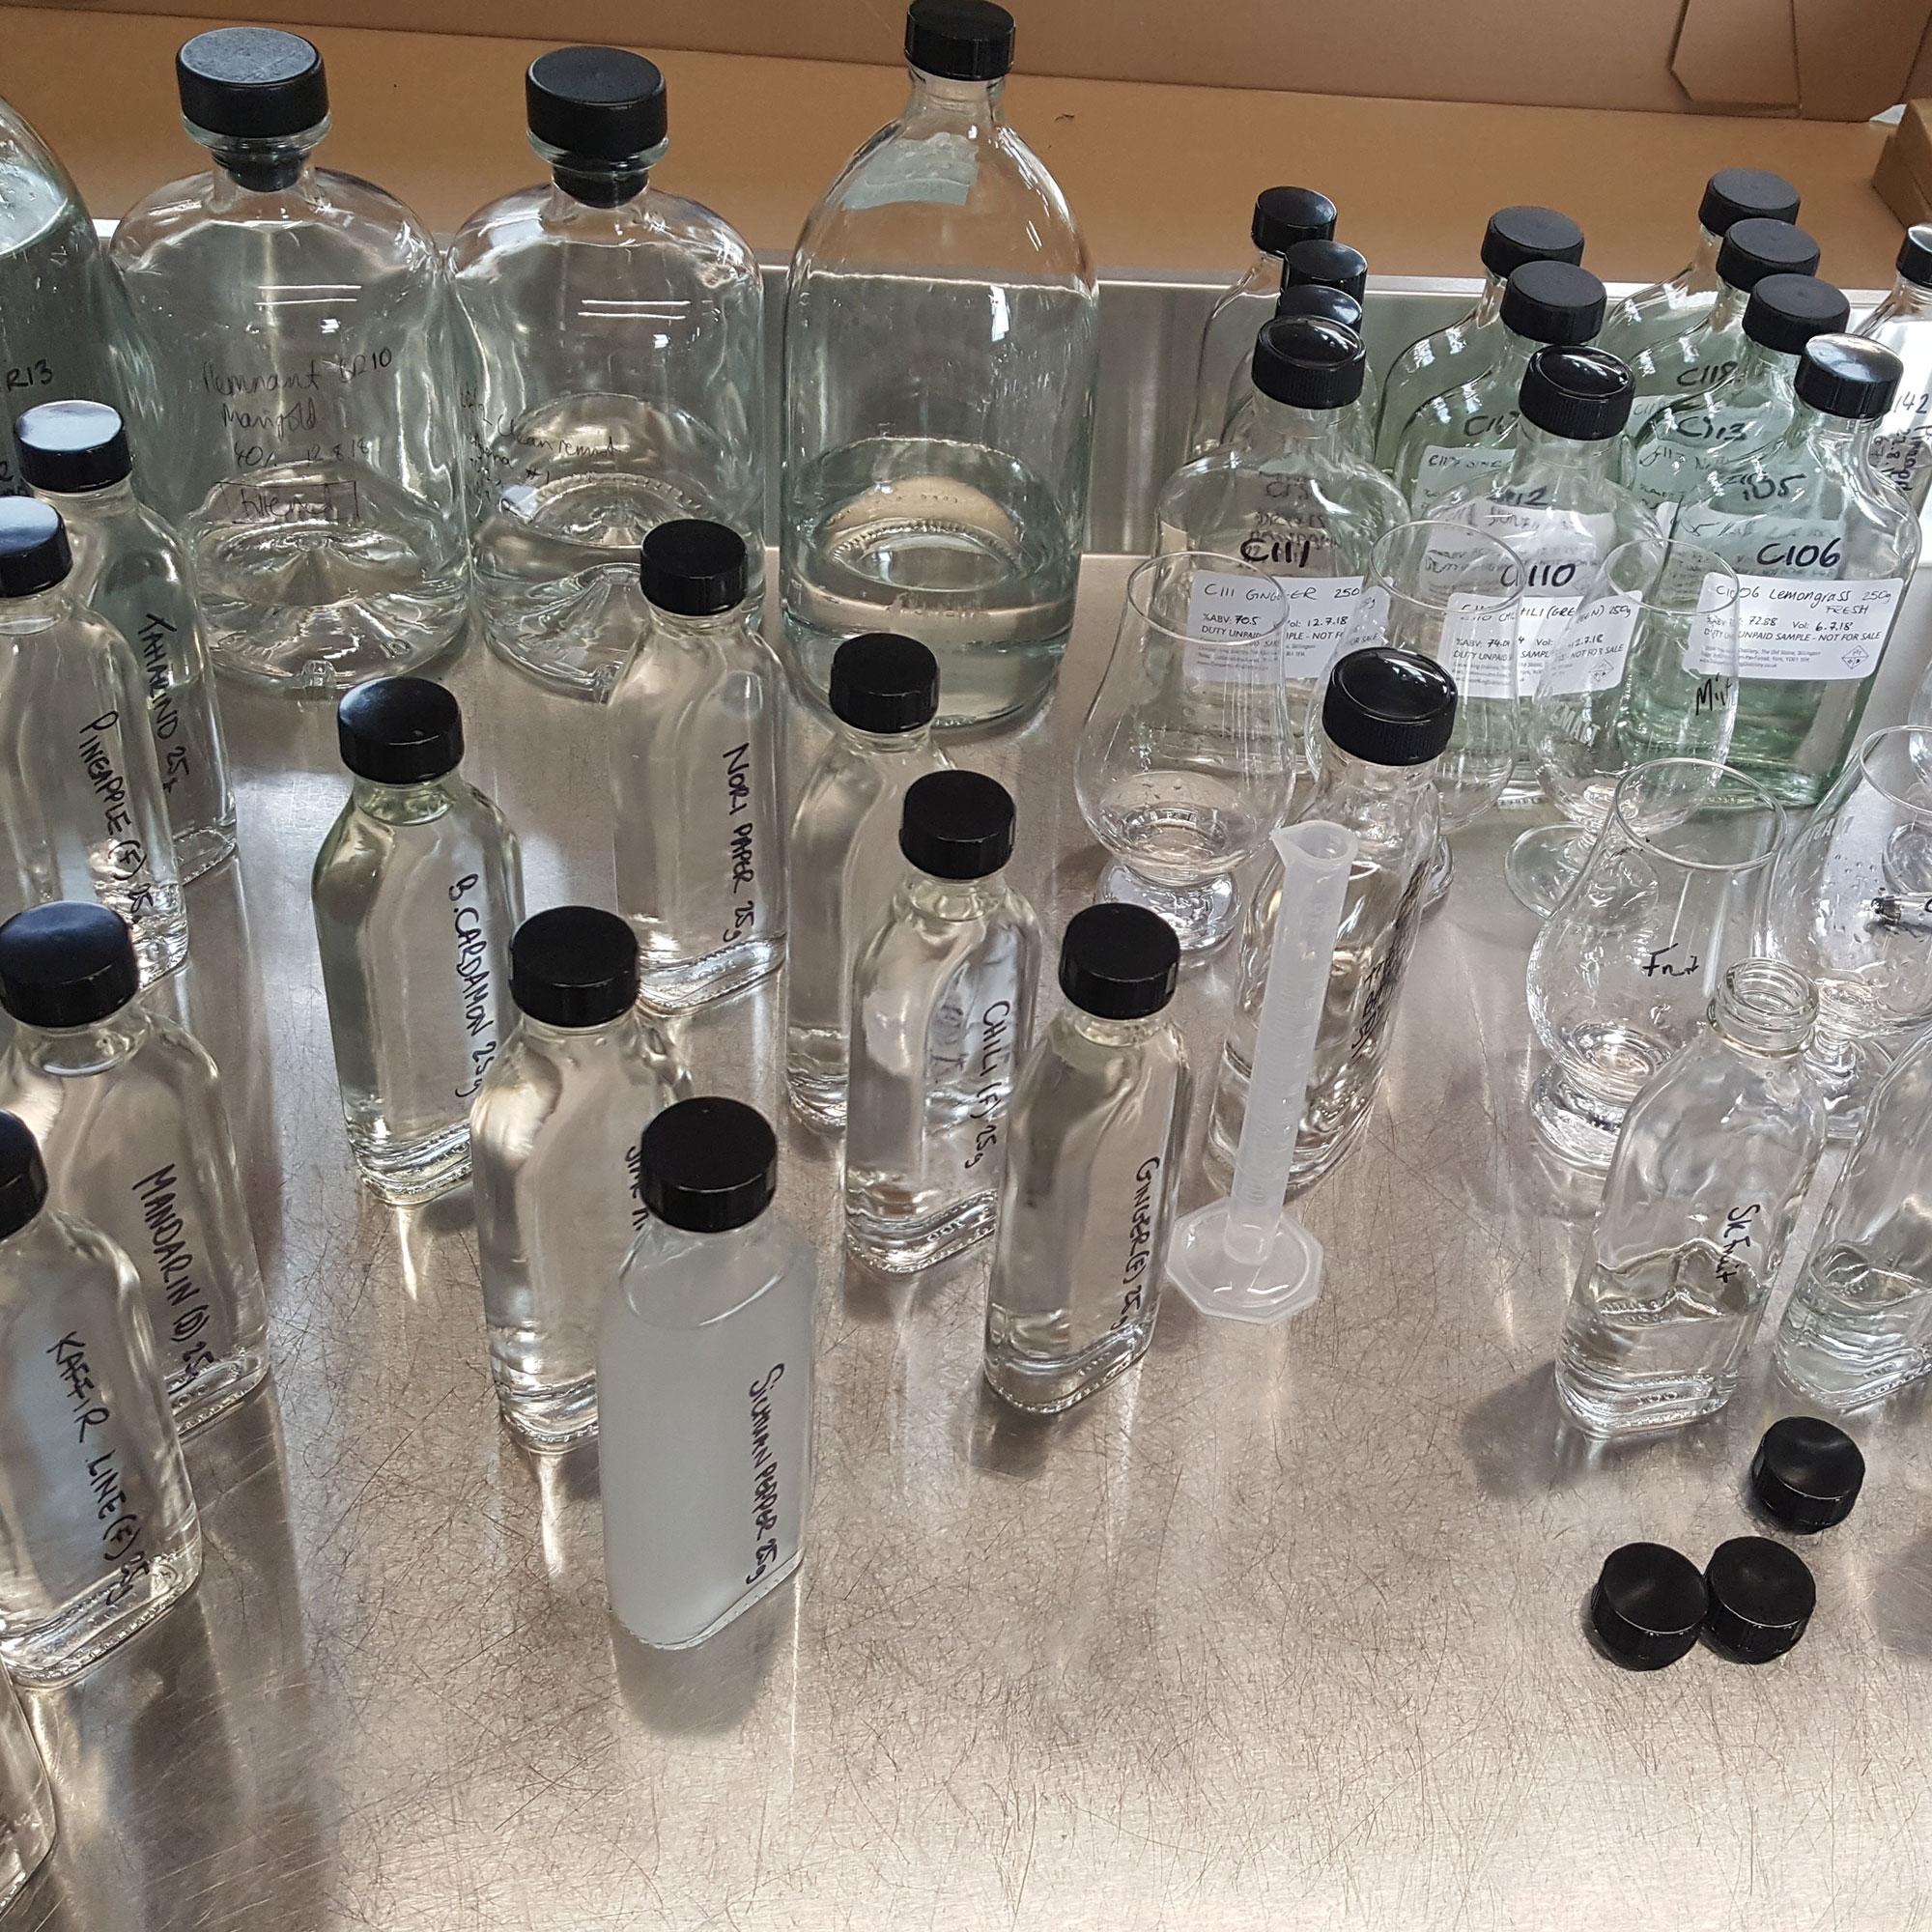 skosh-york-cooper-king-distillery-bespoke-gin.jpg